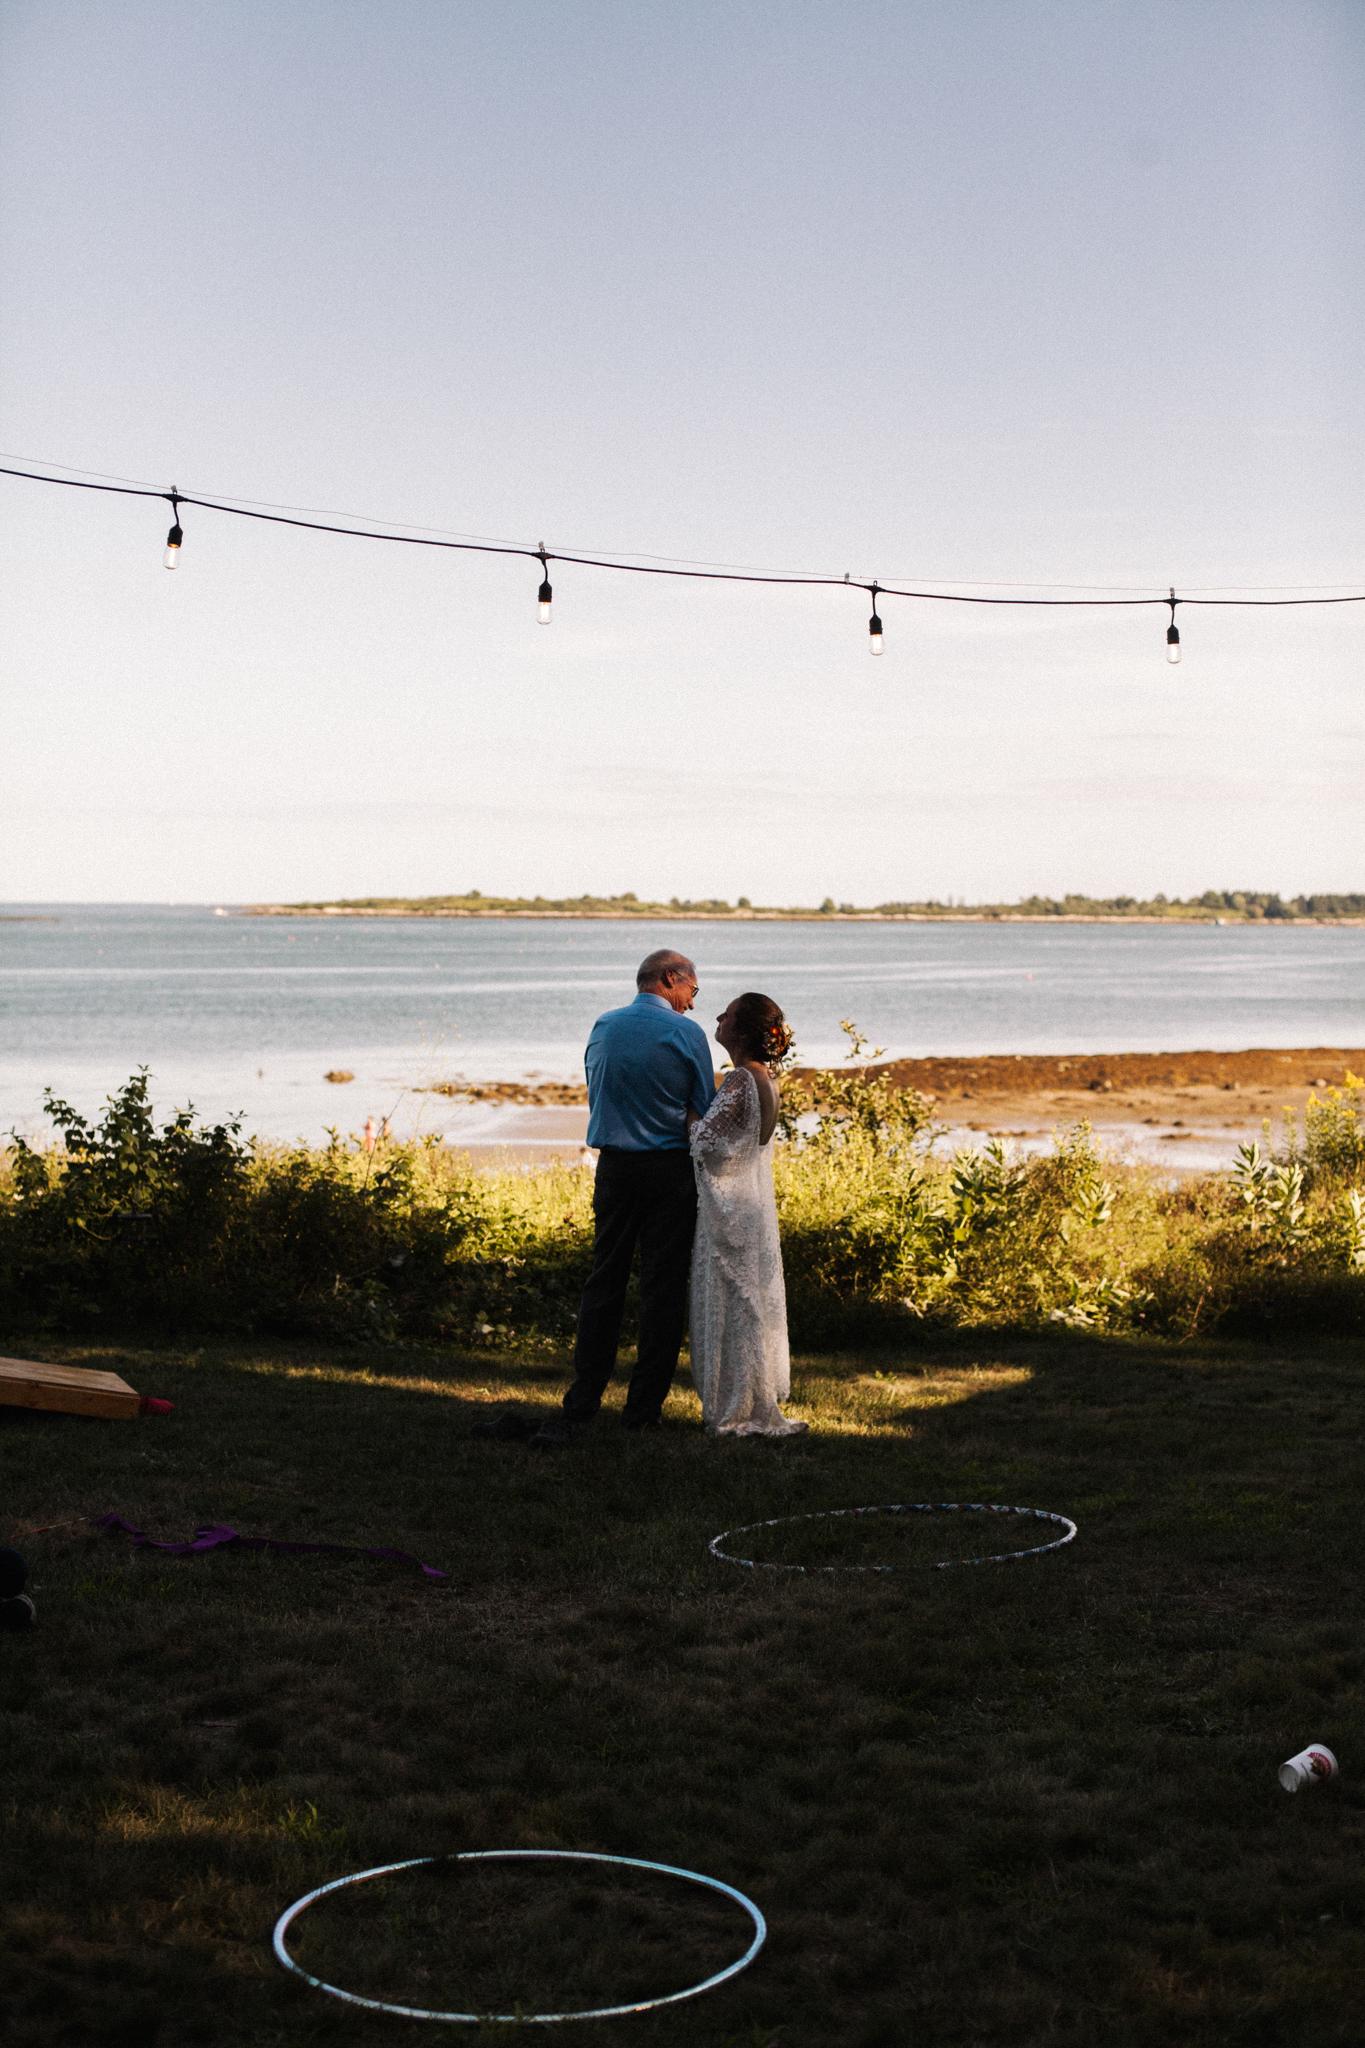 Damian and Jesse Chebeague Island Maine Backyard Destination Beach Wedding White Sails Creative_13.JPG